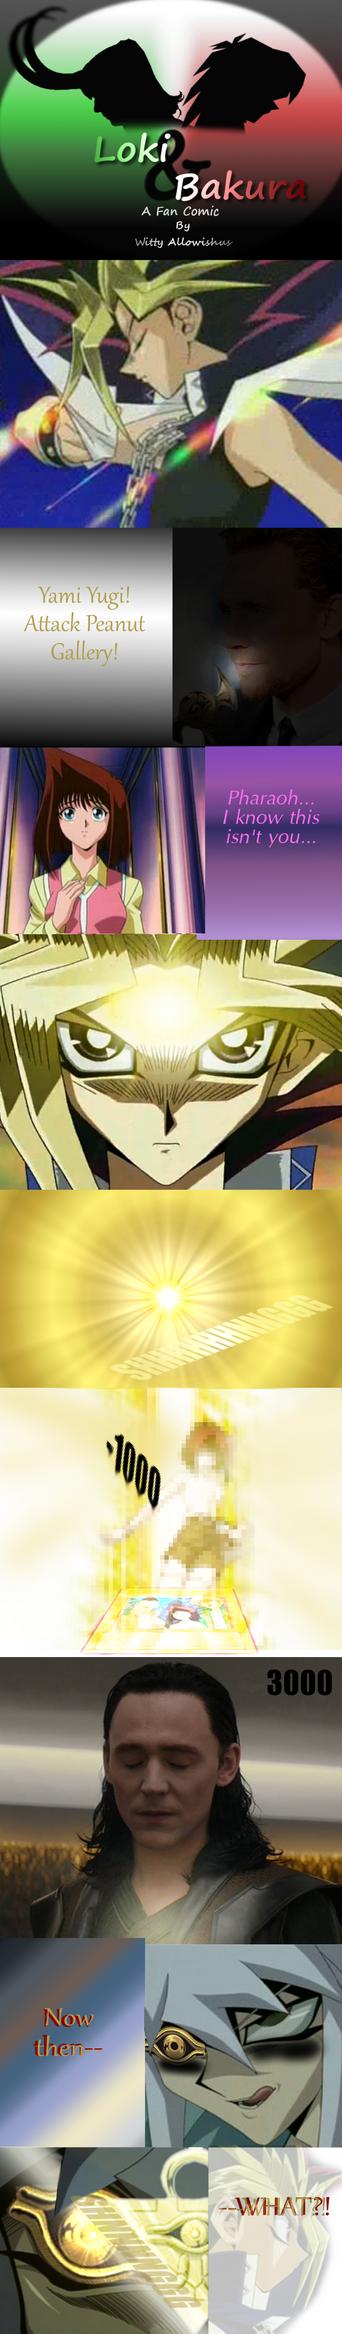 Loki and Bakura XLII - Yami Yugi Summoned by Loki-Bakura